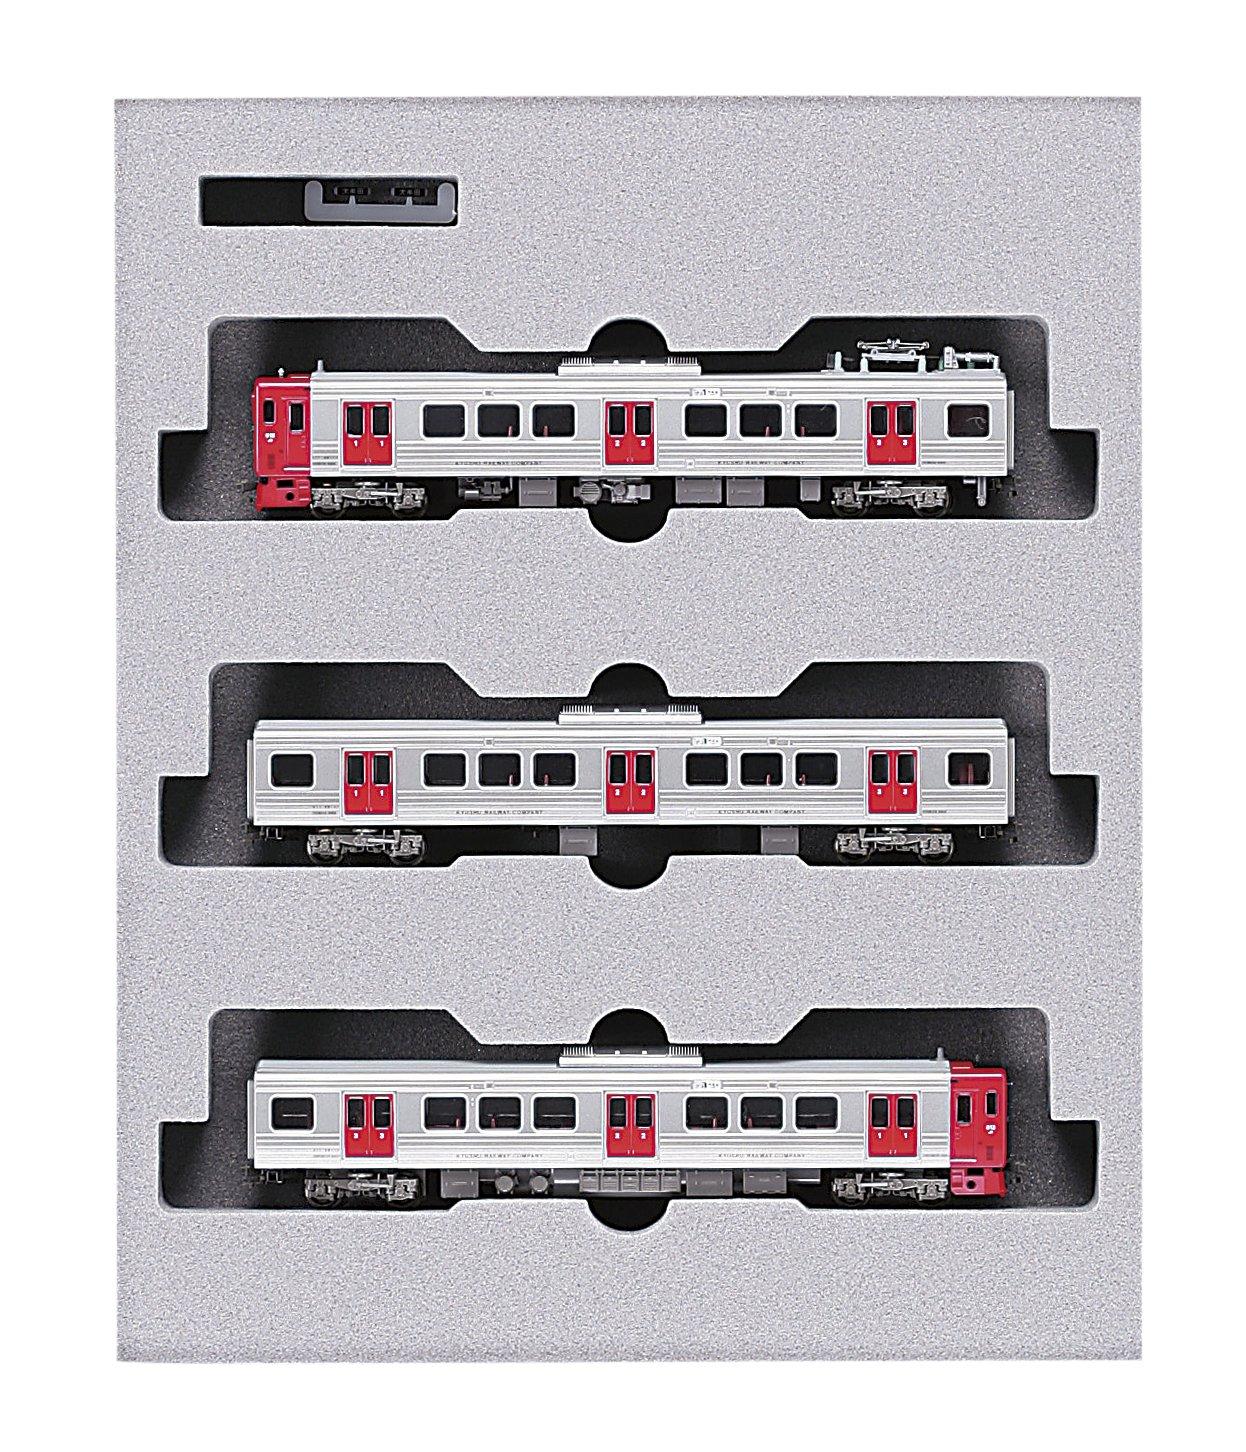 KATO Nゲージ 813系 200番台 3両セット 10-813 鉄道模型 電車   B0057UDTVK